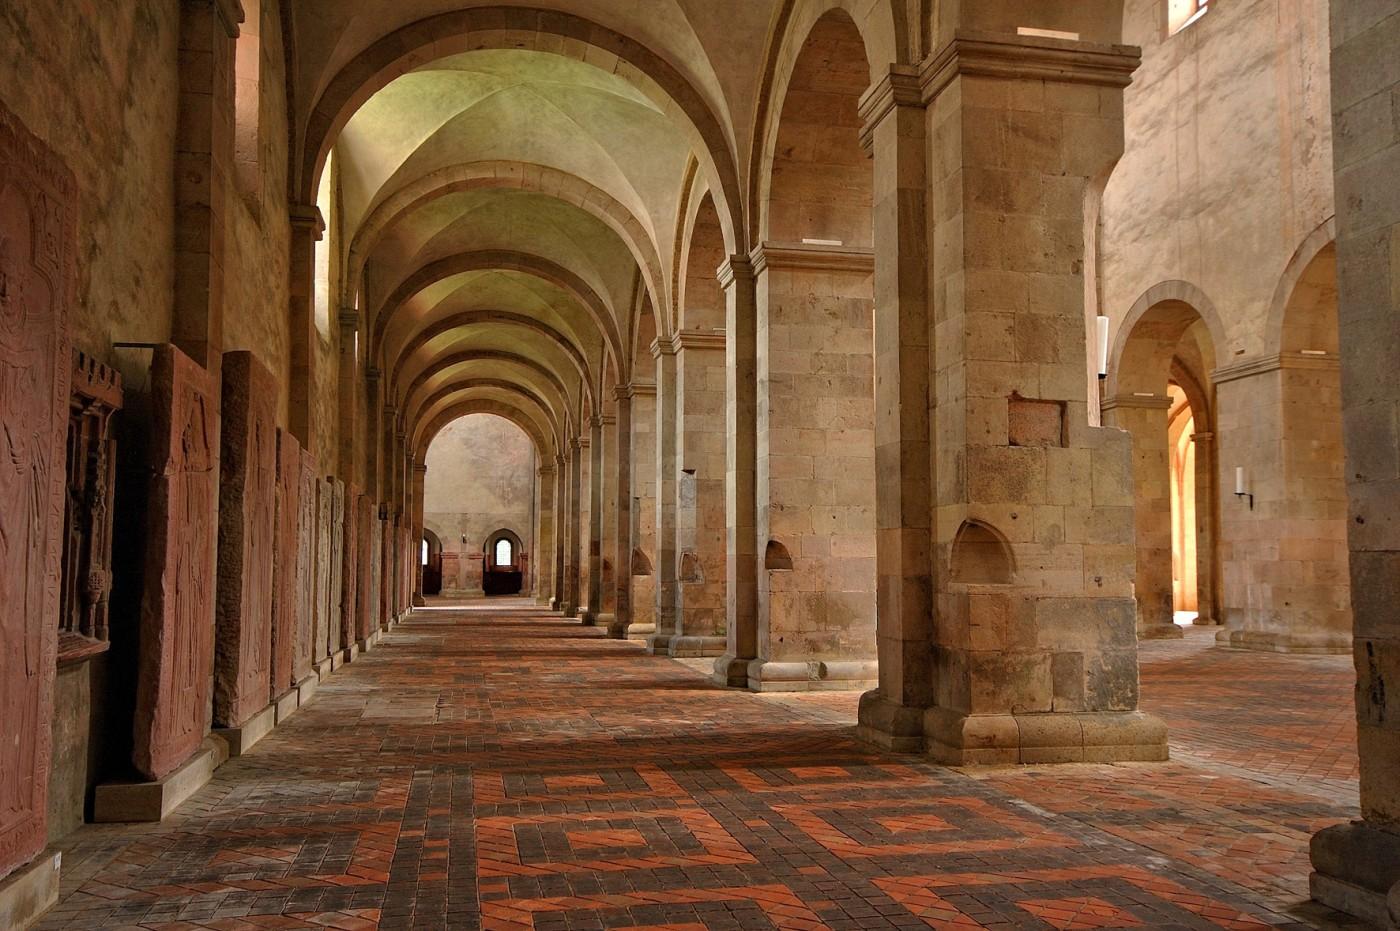 basilika-c-stiftung-kloster-eberbach